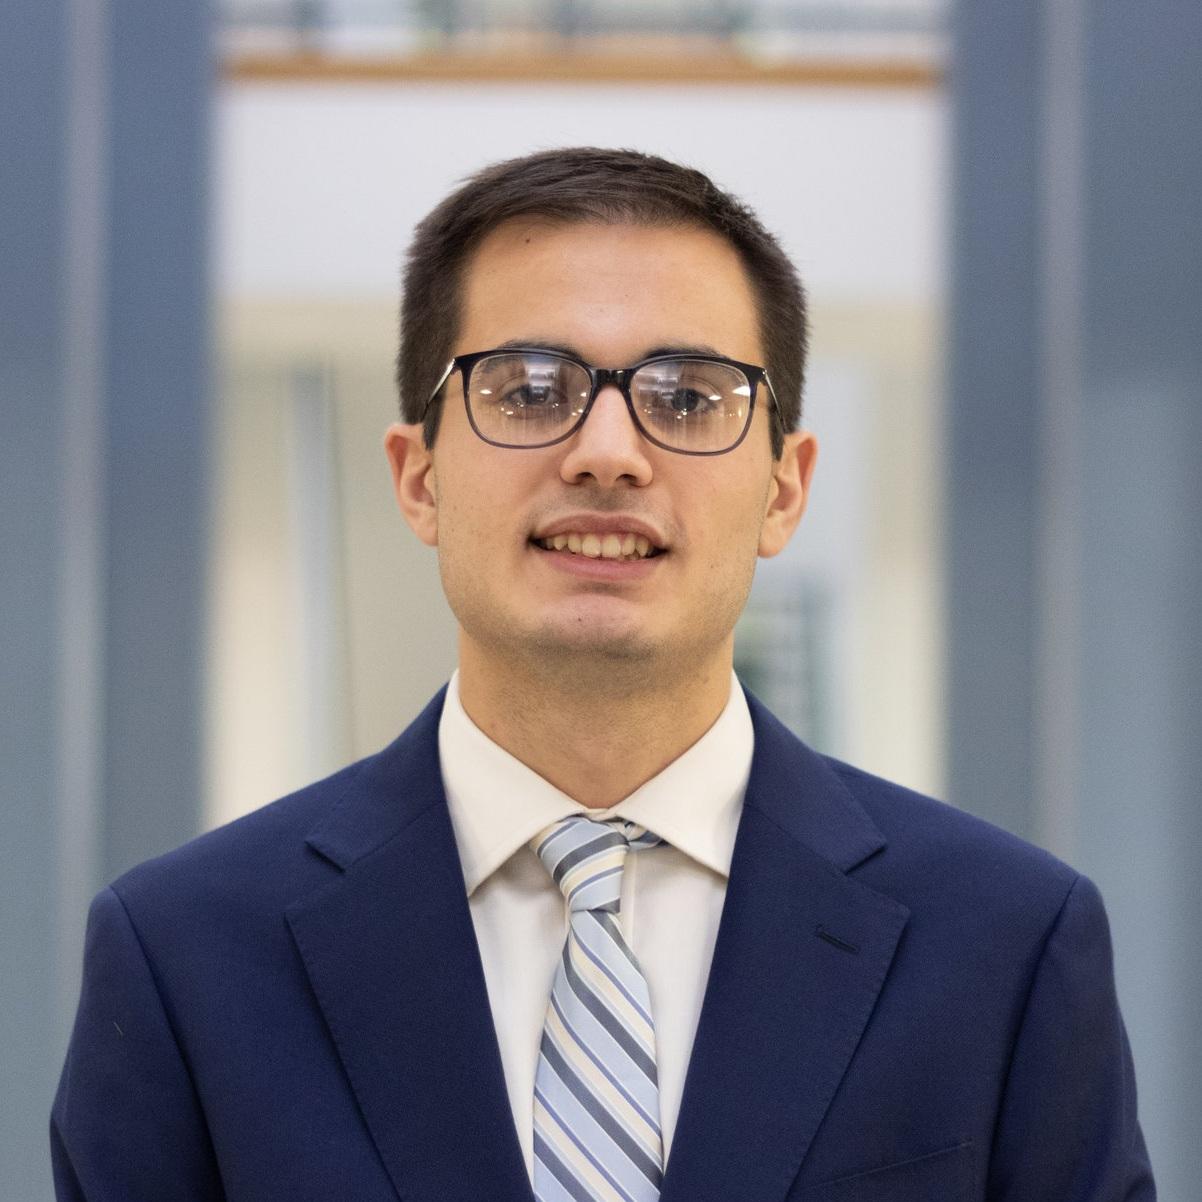 NICHOLAS ZOURAS    Finance & Business Information Systems, 2022